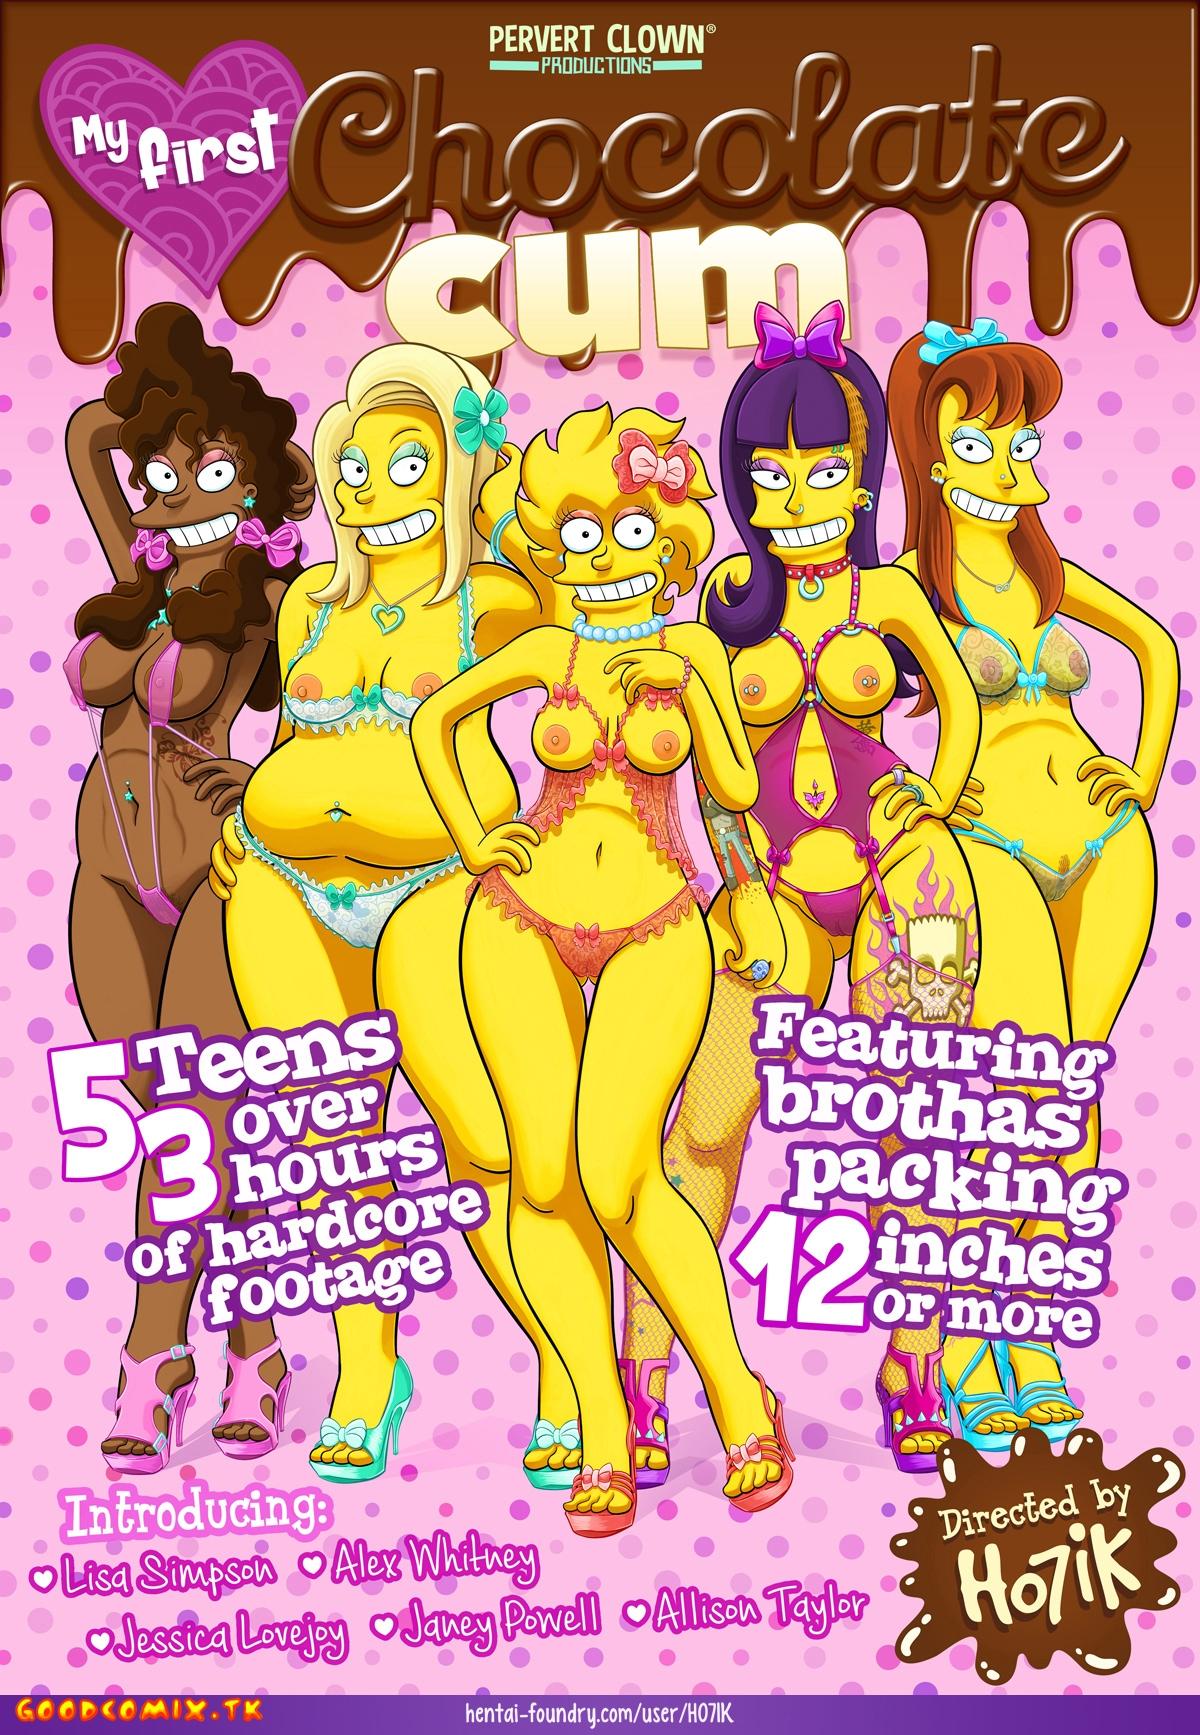 Goodcomix The Simpsons - [Yb-Ho7ik] - My First Chocolate Cum